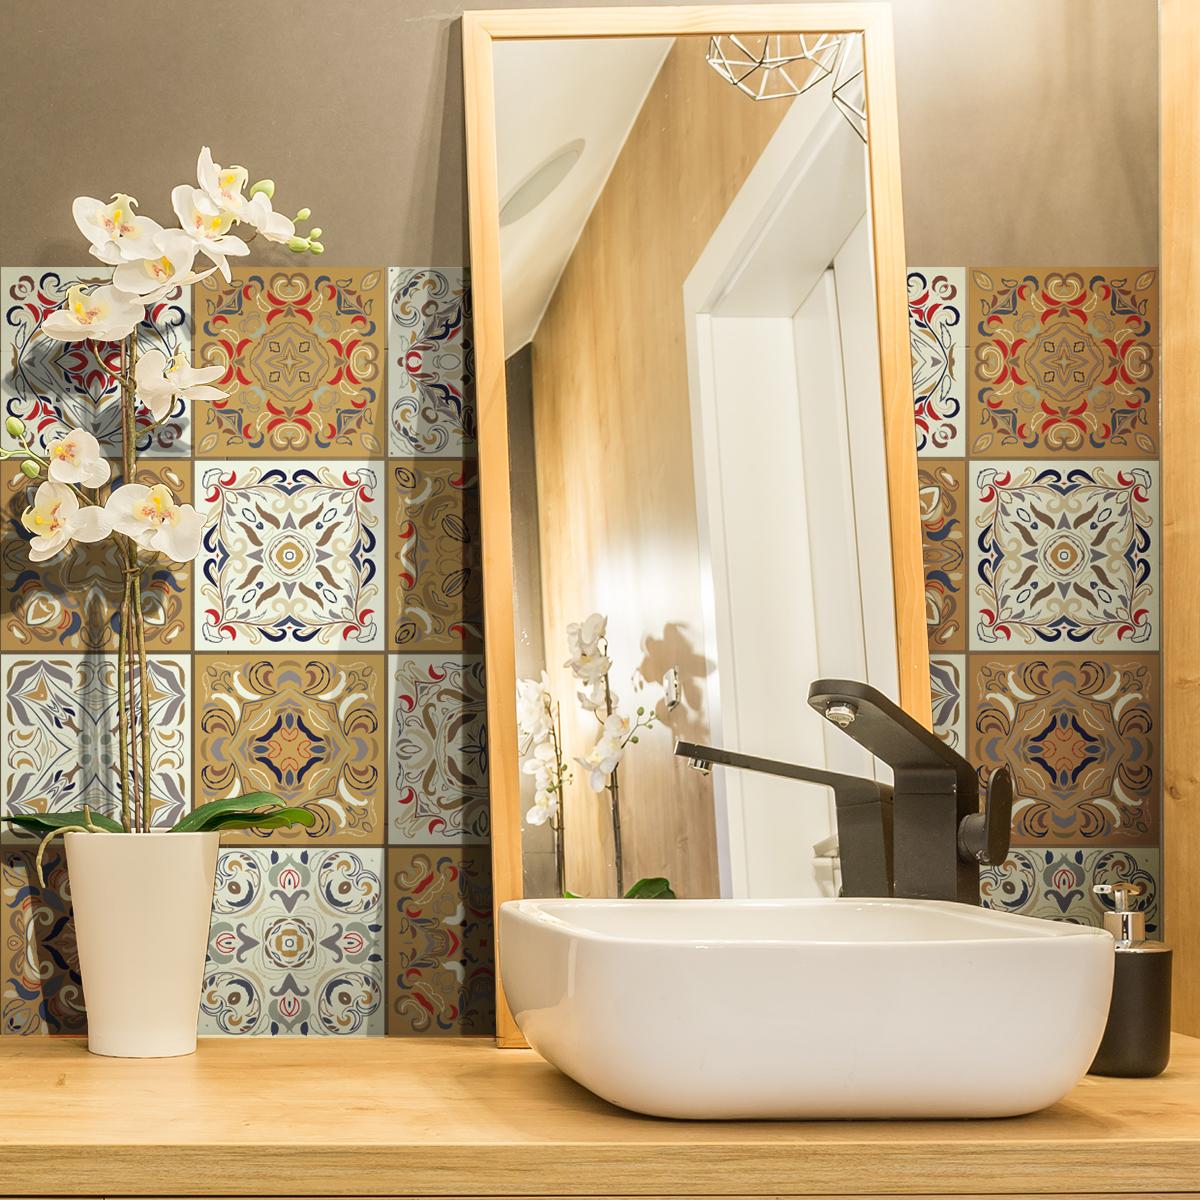 24 stickers carreaux de ciment azulejos bonifacio. Black Bedroom Furniture Sets. Home Design Ideas